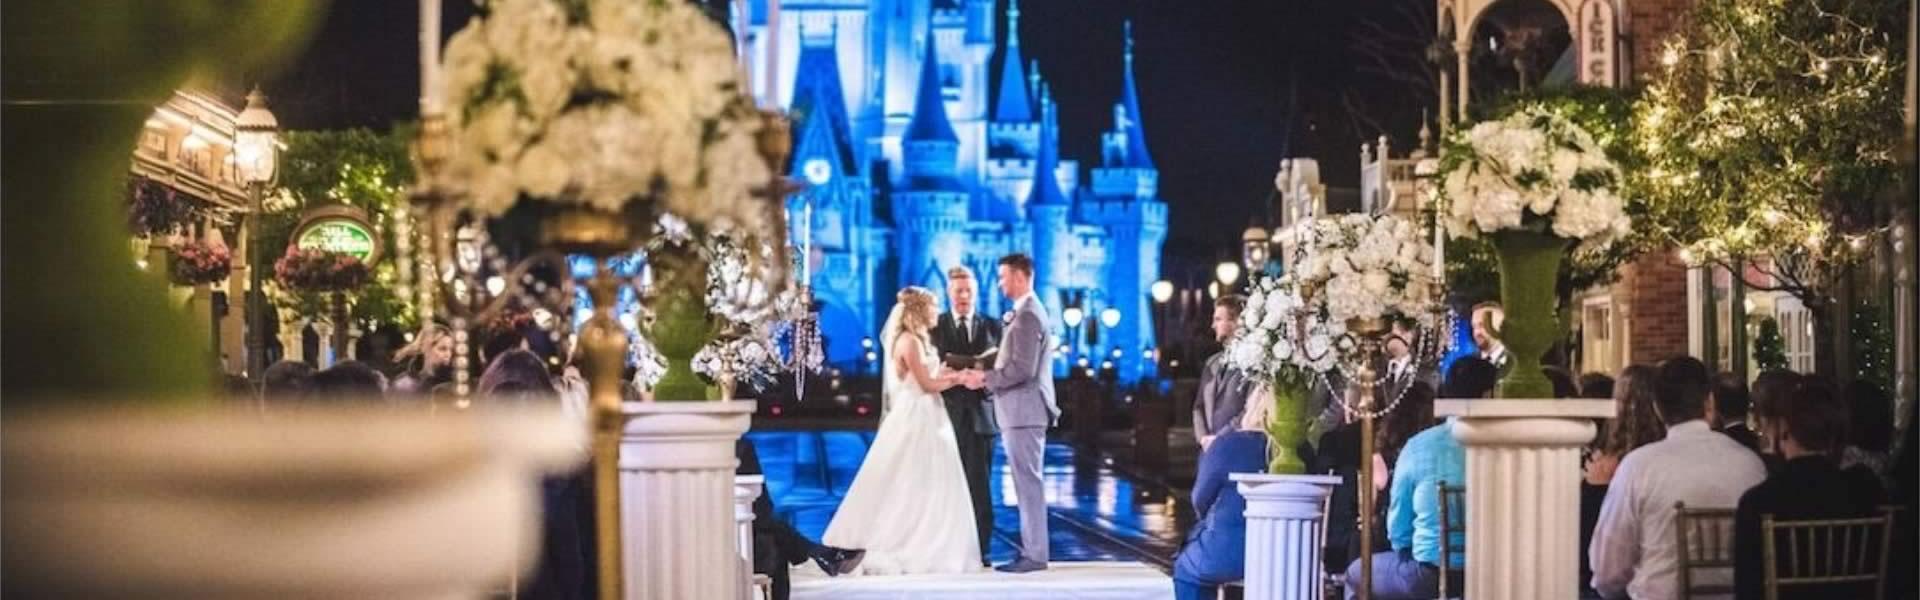 Orlando - Sensational Ceremonies